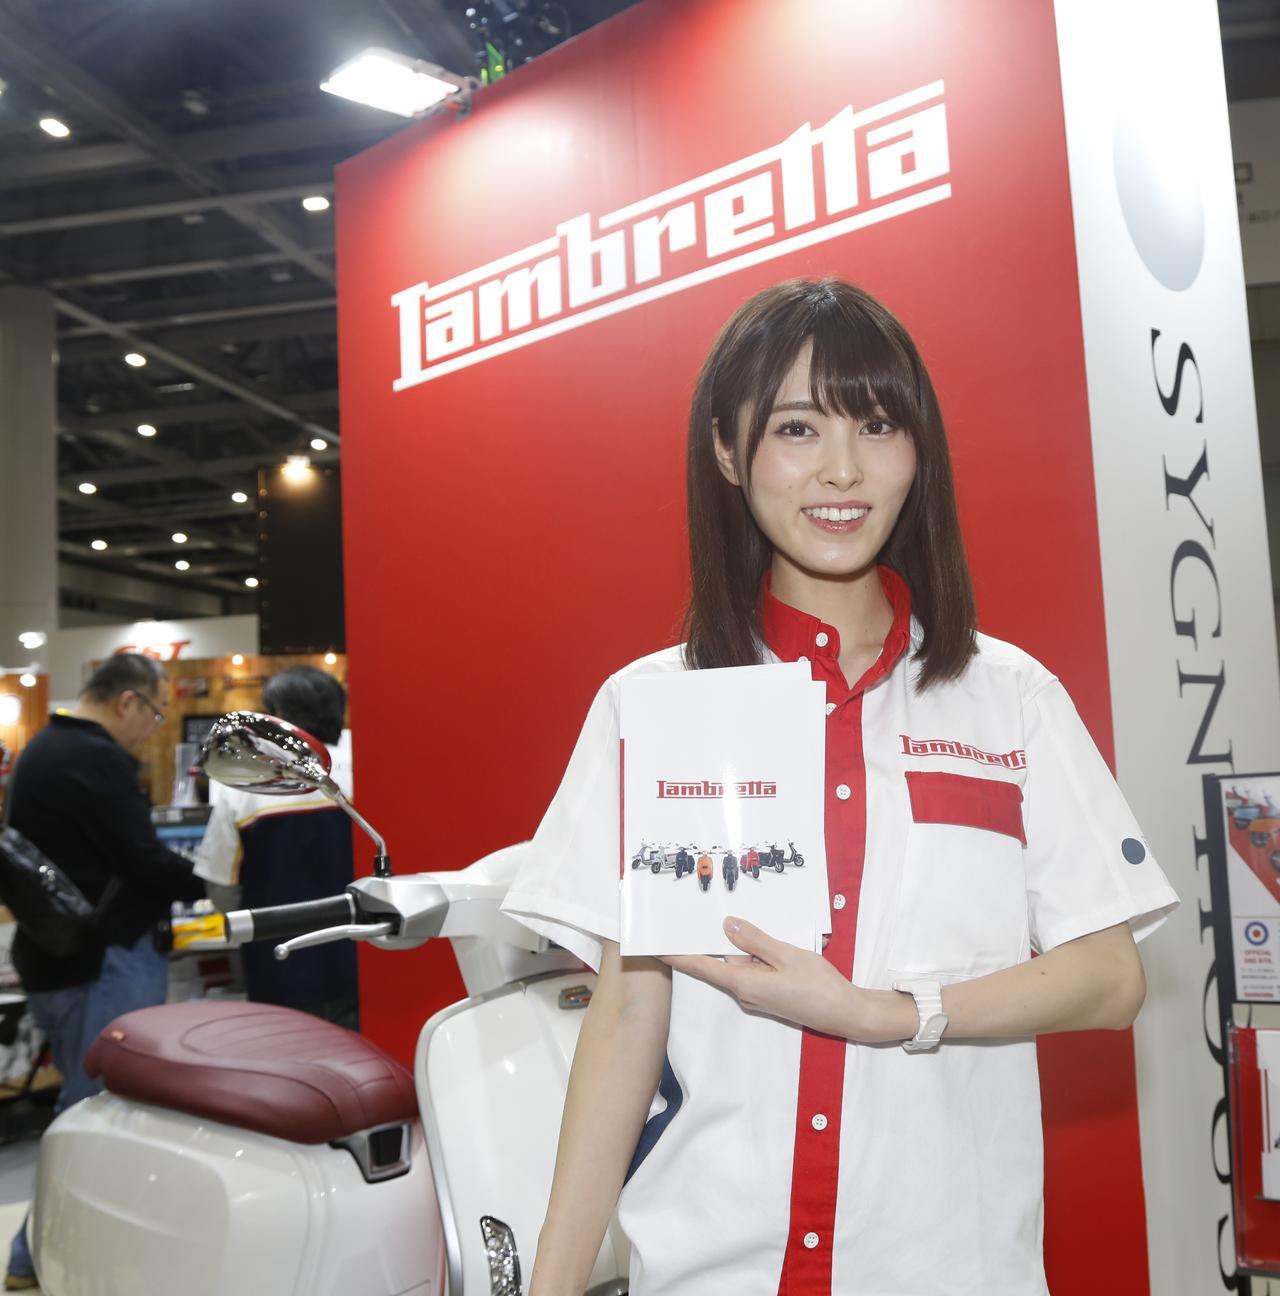 Images : 7番目の画像 - TMCS2019 美女コンパニオン図鑑! - webオートバイ